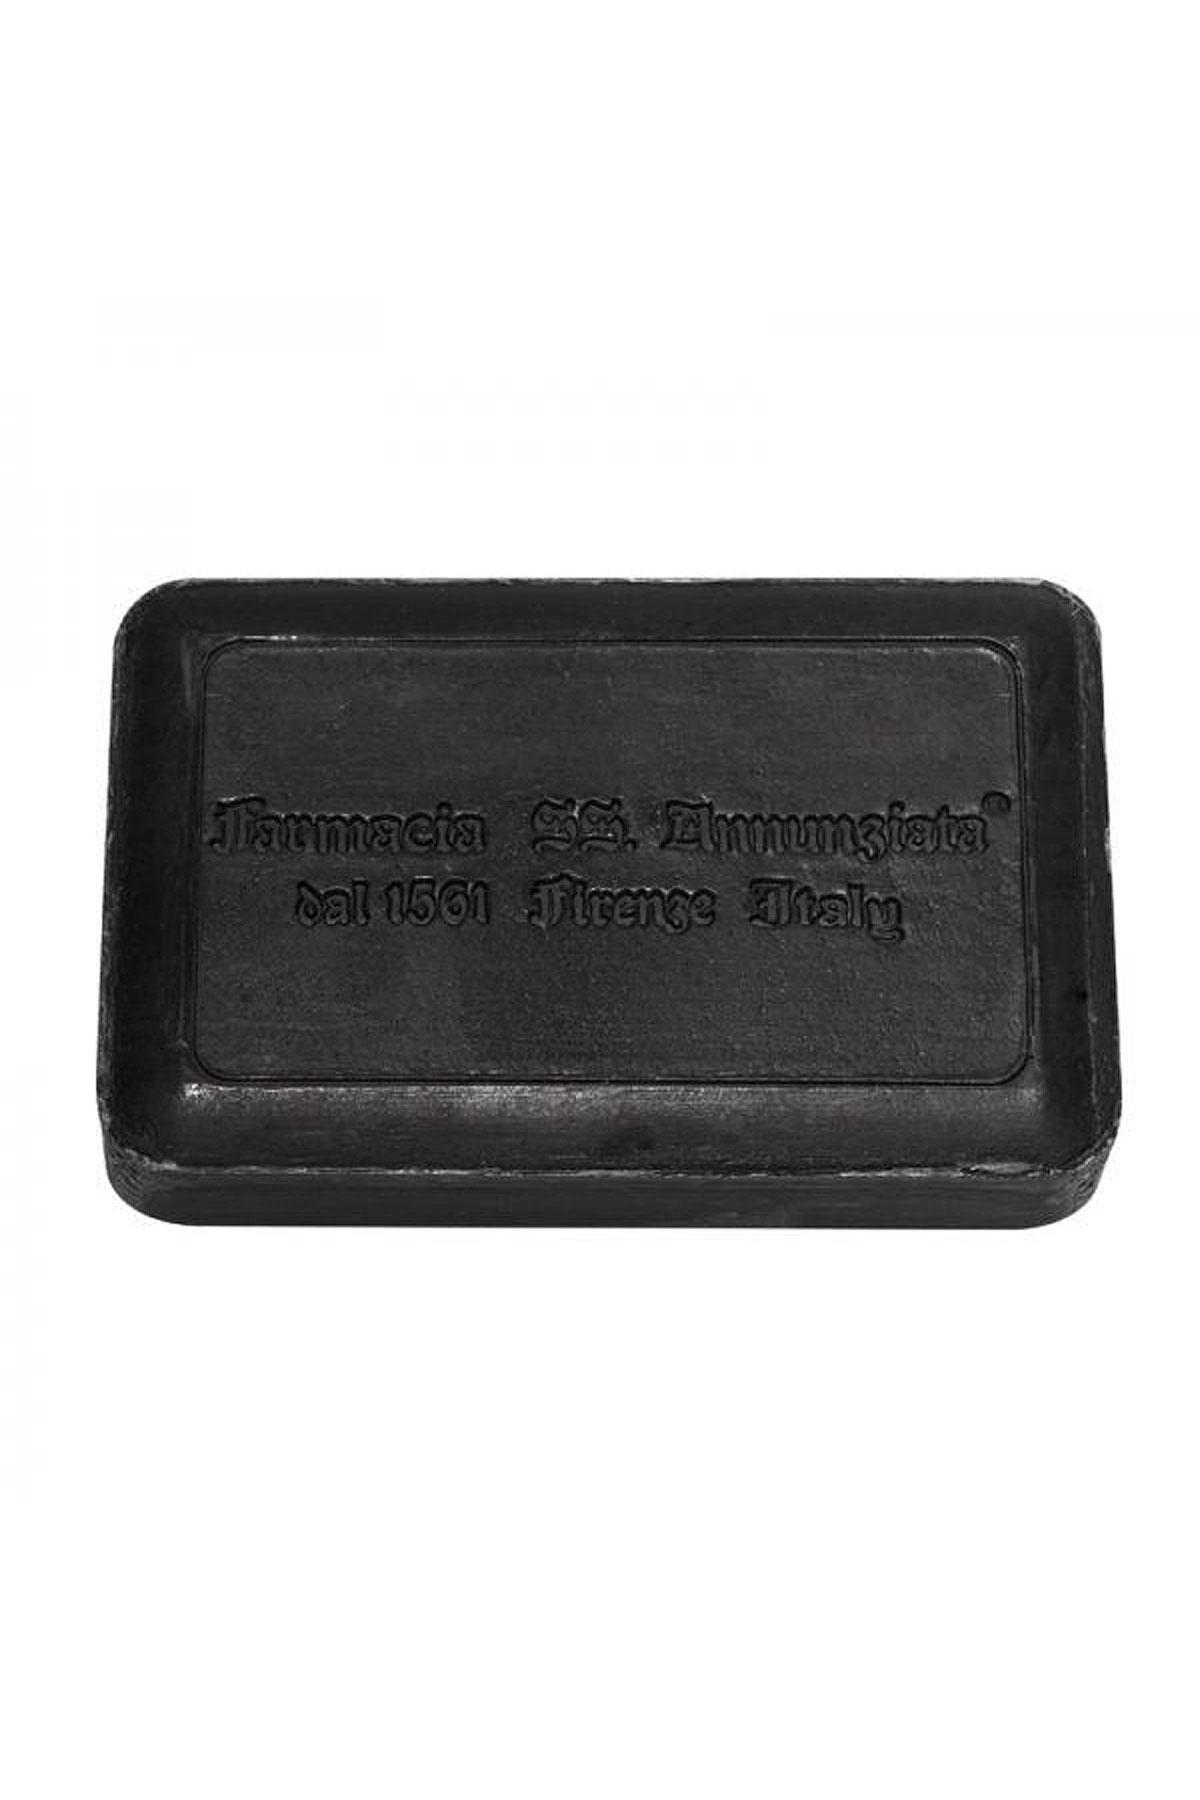 Farmacia Ss Annunziata 1561 Beauty for Men On Sale, Isos - Soap - 150 Gr, 2019, 150 gr